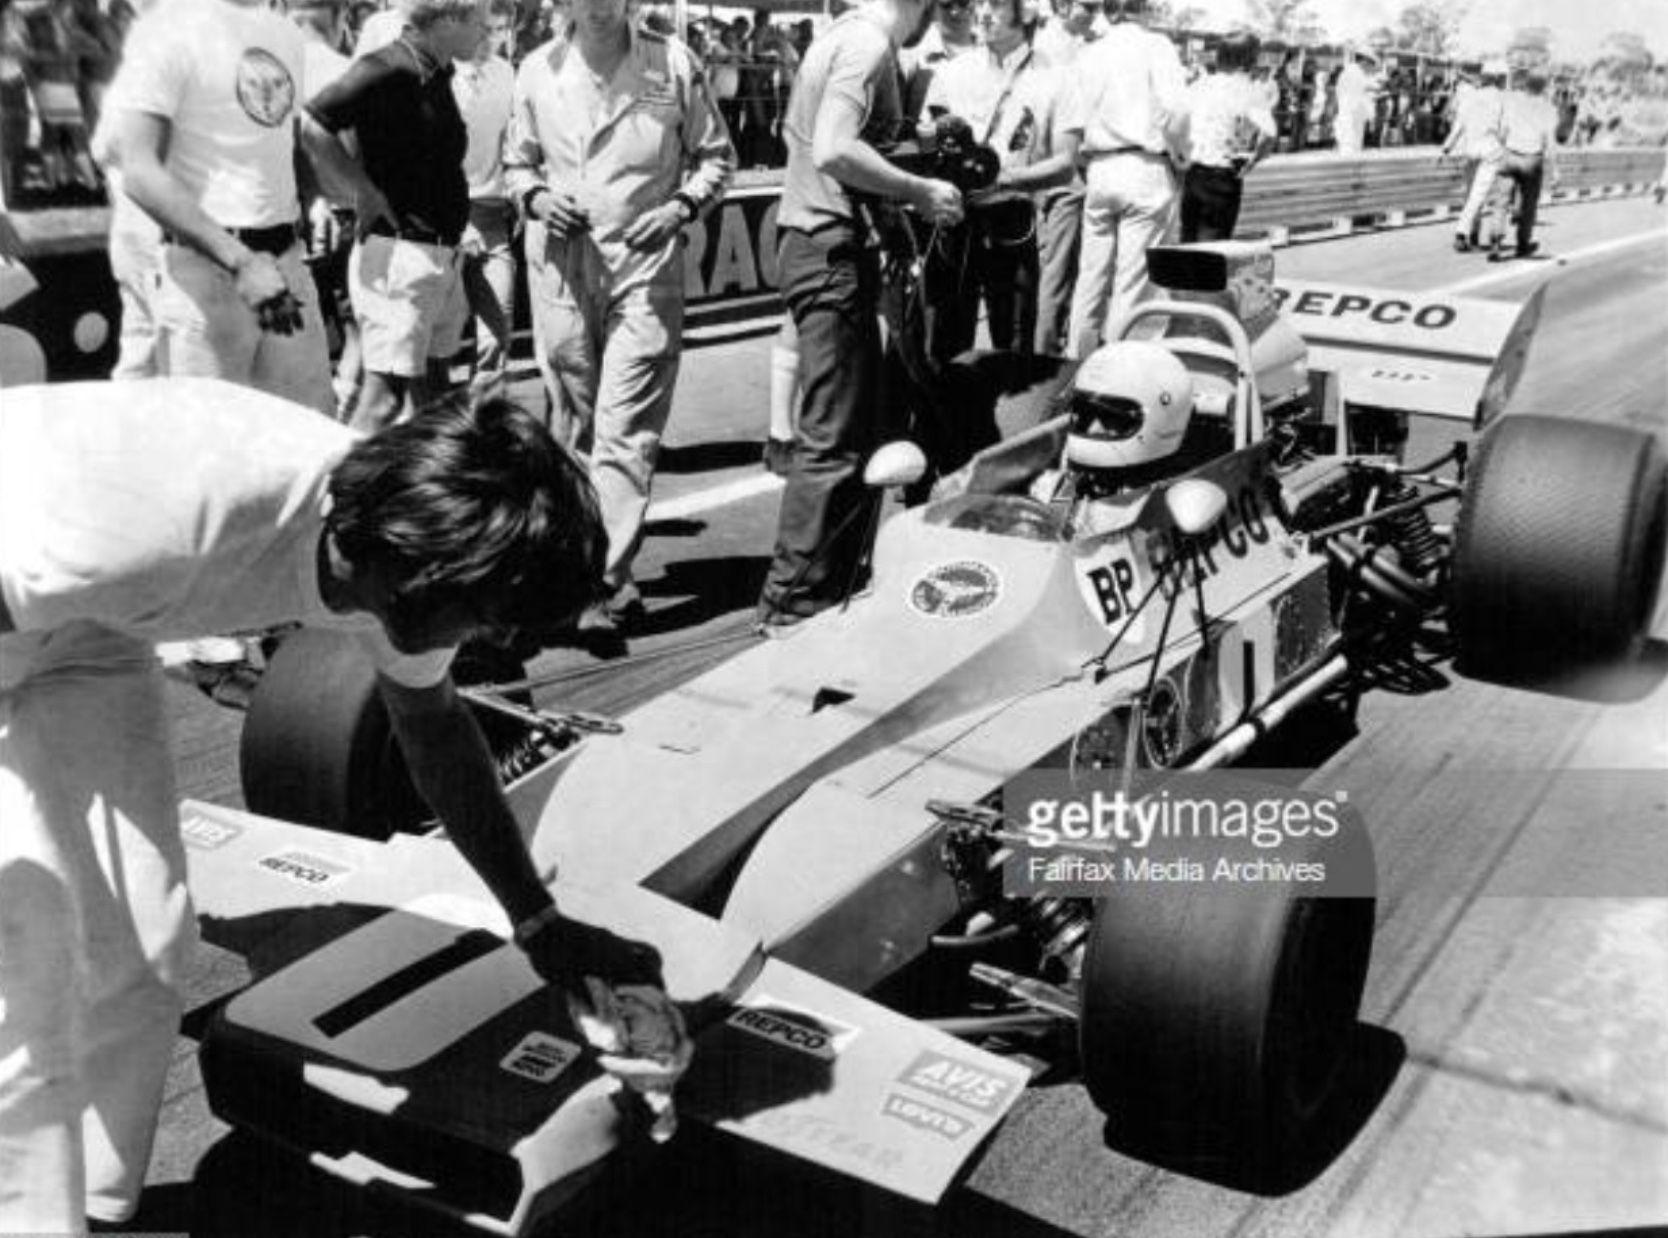 Matich A50 Repco Agp Grid 1971 F Matich Australian Grand Prix Grand Prix Motorsport [ 1238 x 1668 Pixel ]